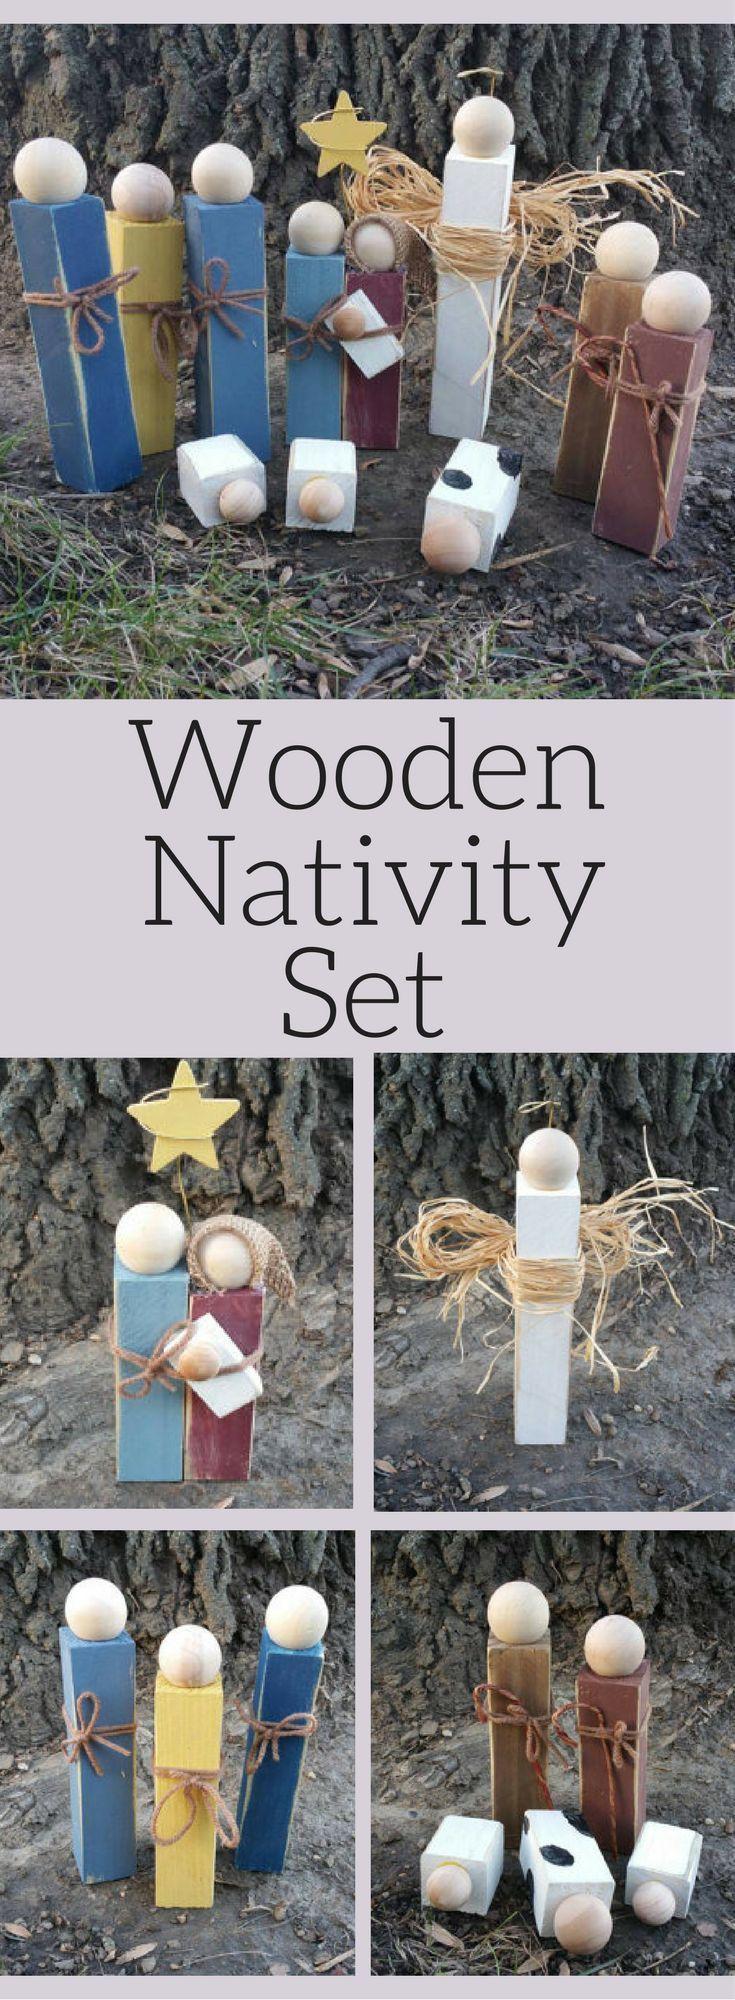 25+ unique Nativity scenes ideas on Pinterest | Christmas ...